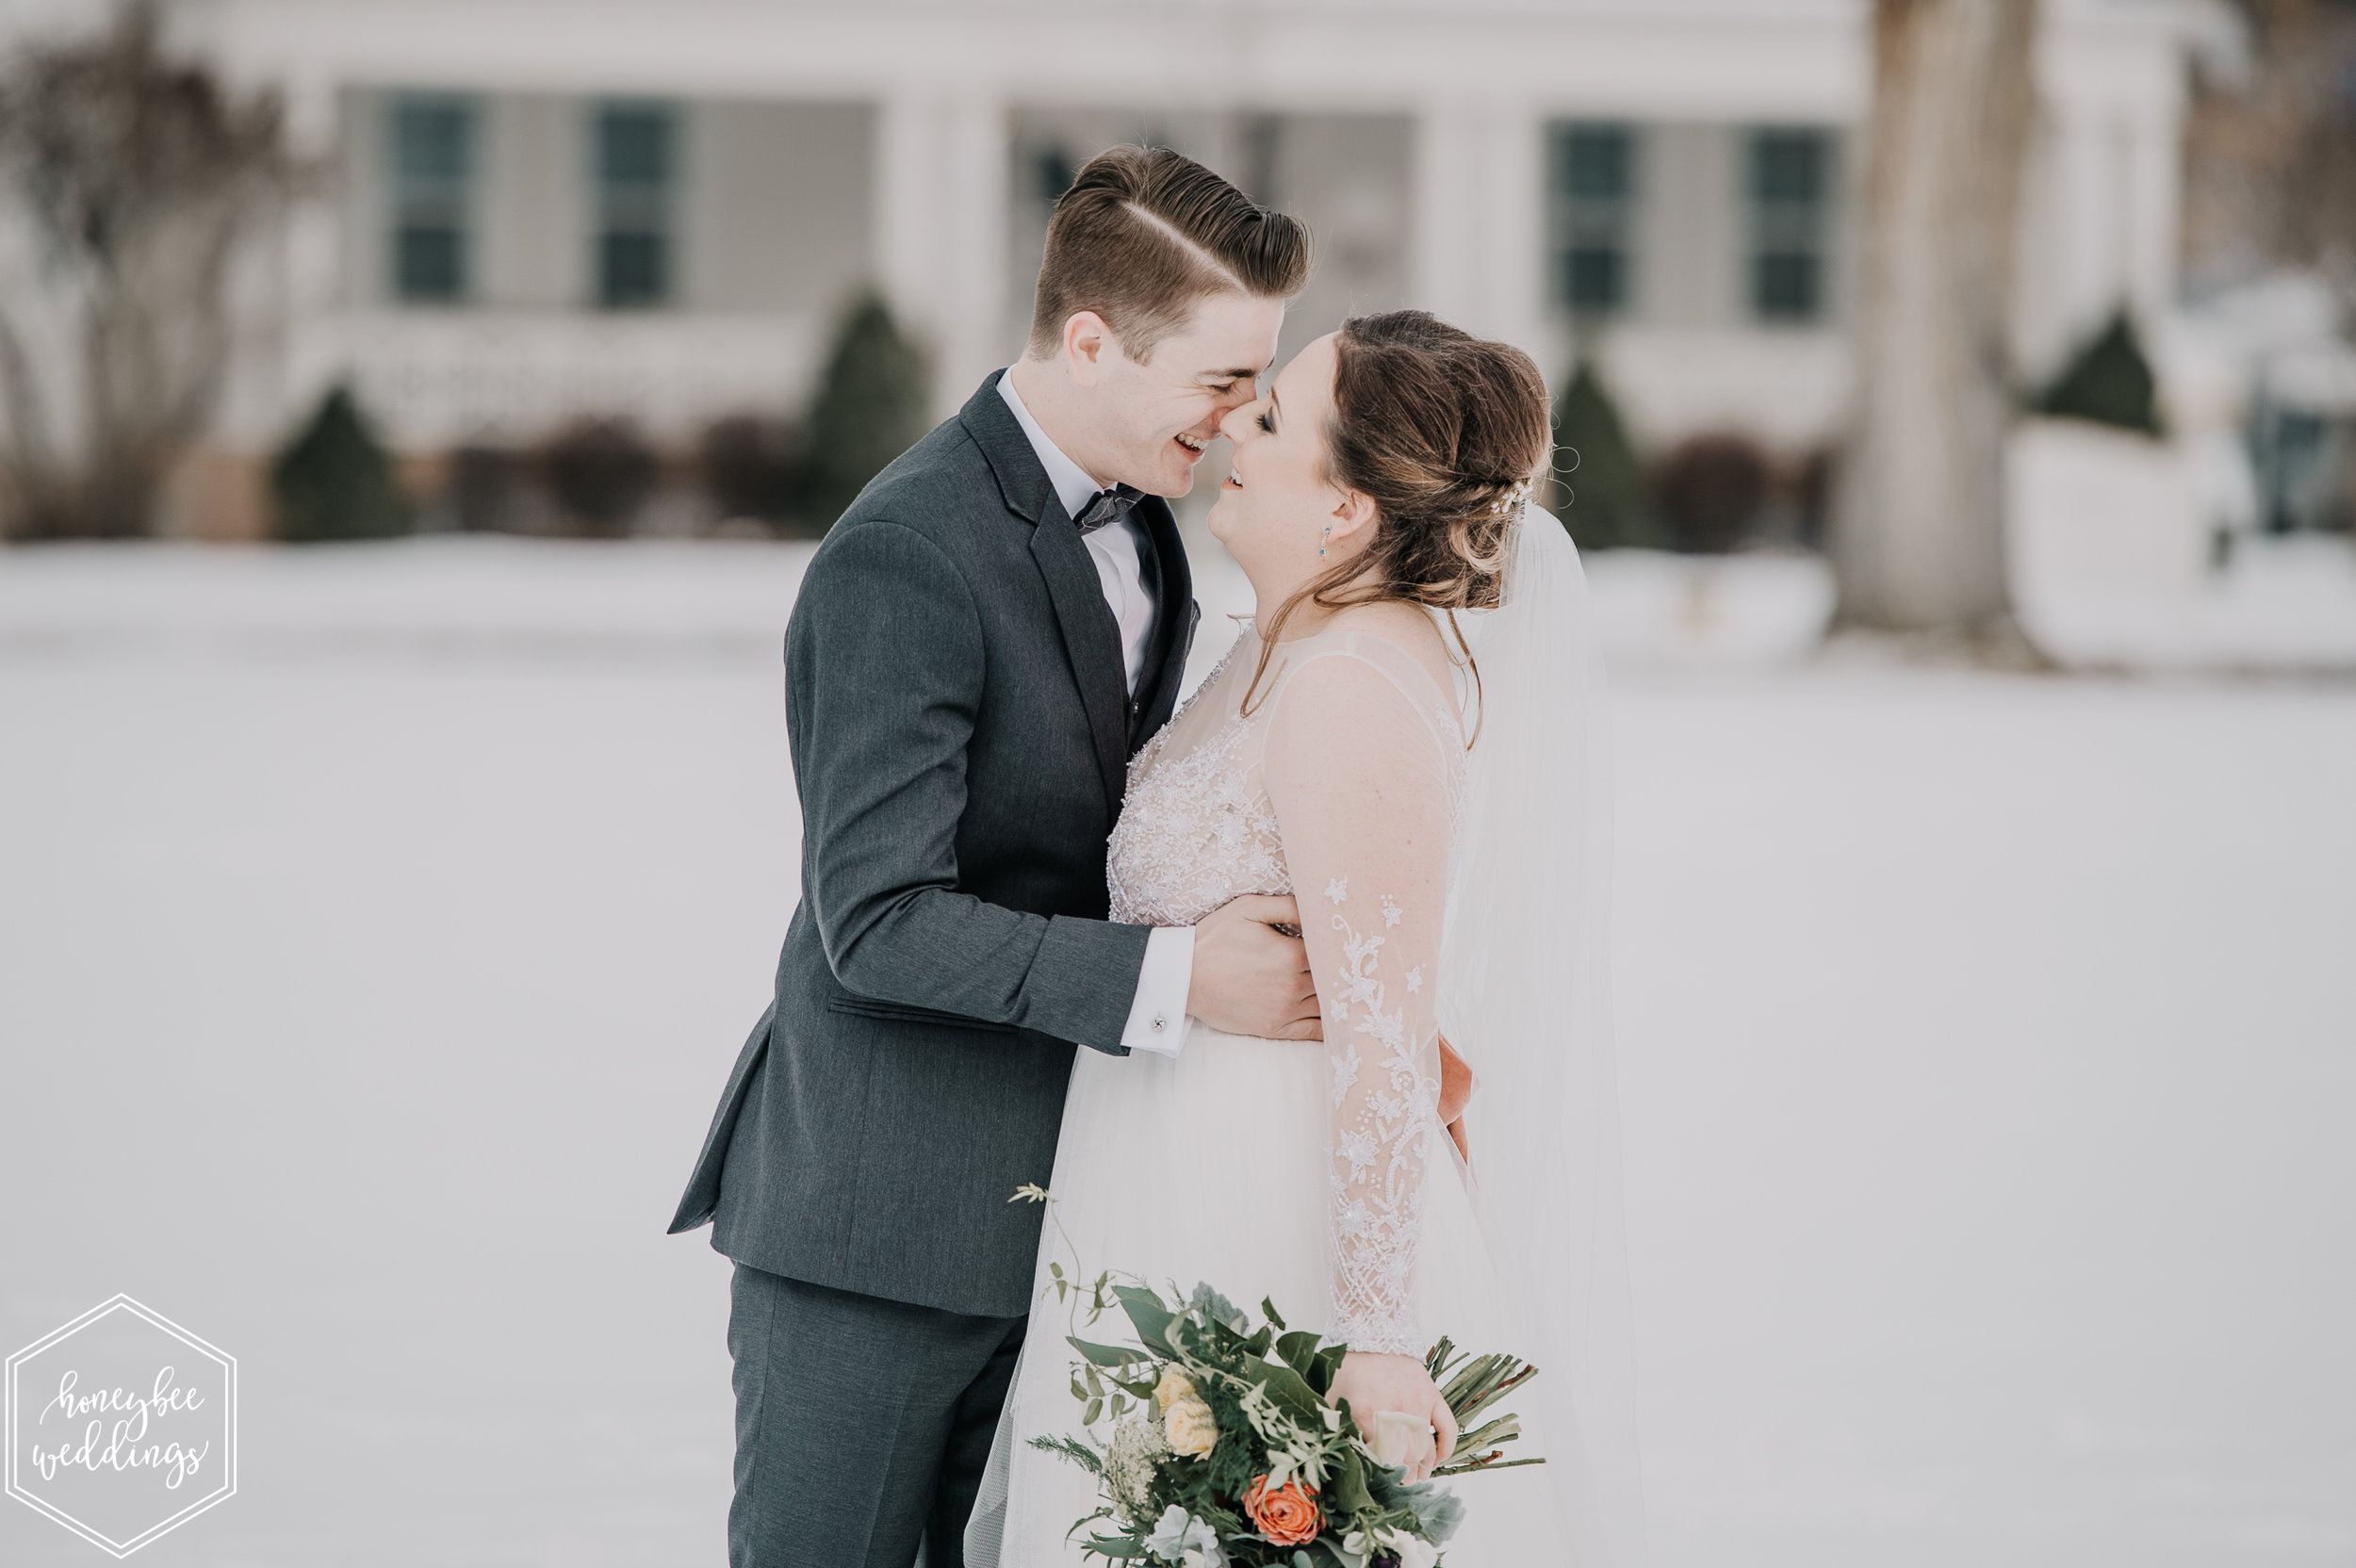 0148Montana Wedding Photographer_Montana winter wedding_Wedding at Fort Missoula_Meri & Carter_January 19, 2019-269.jpg